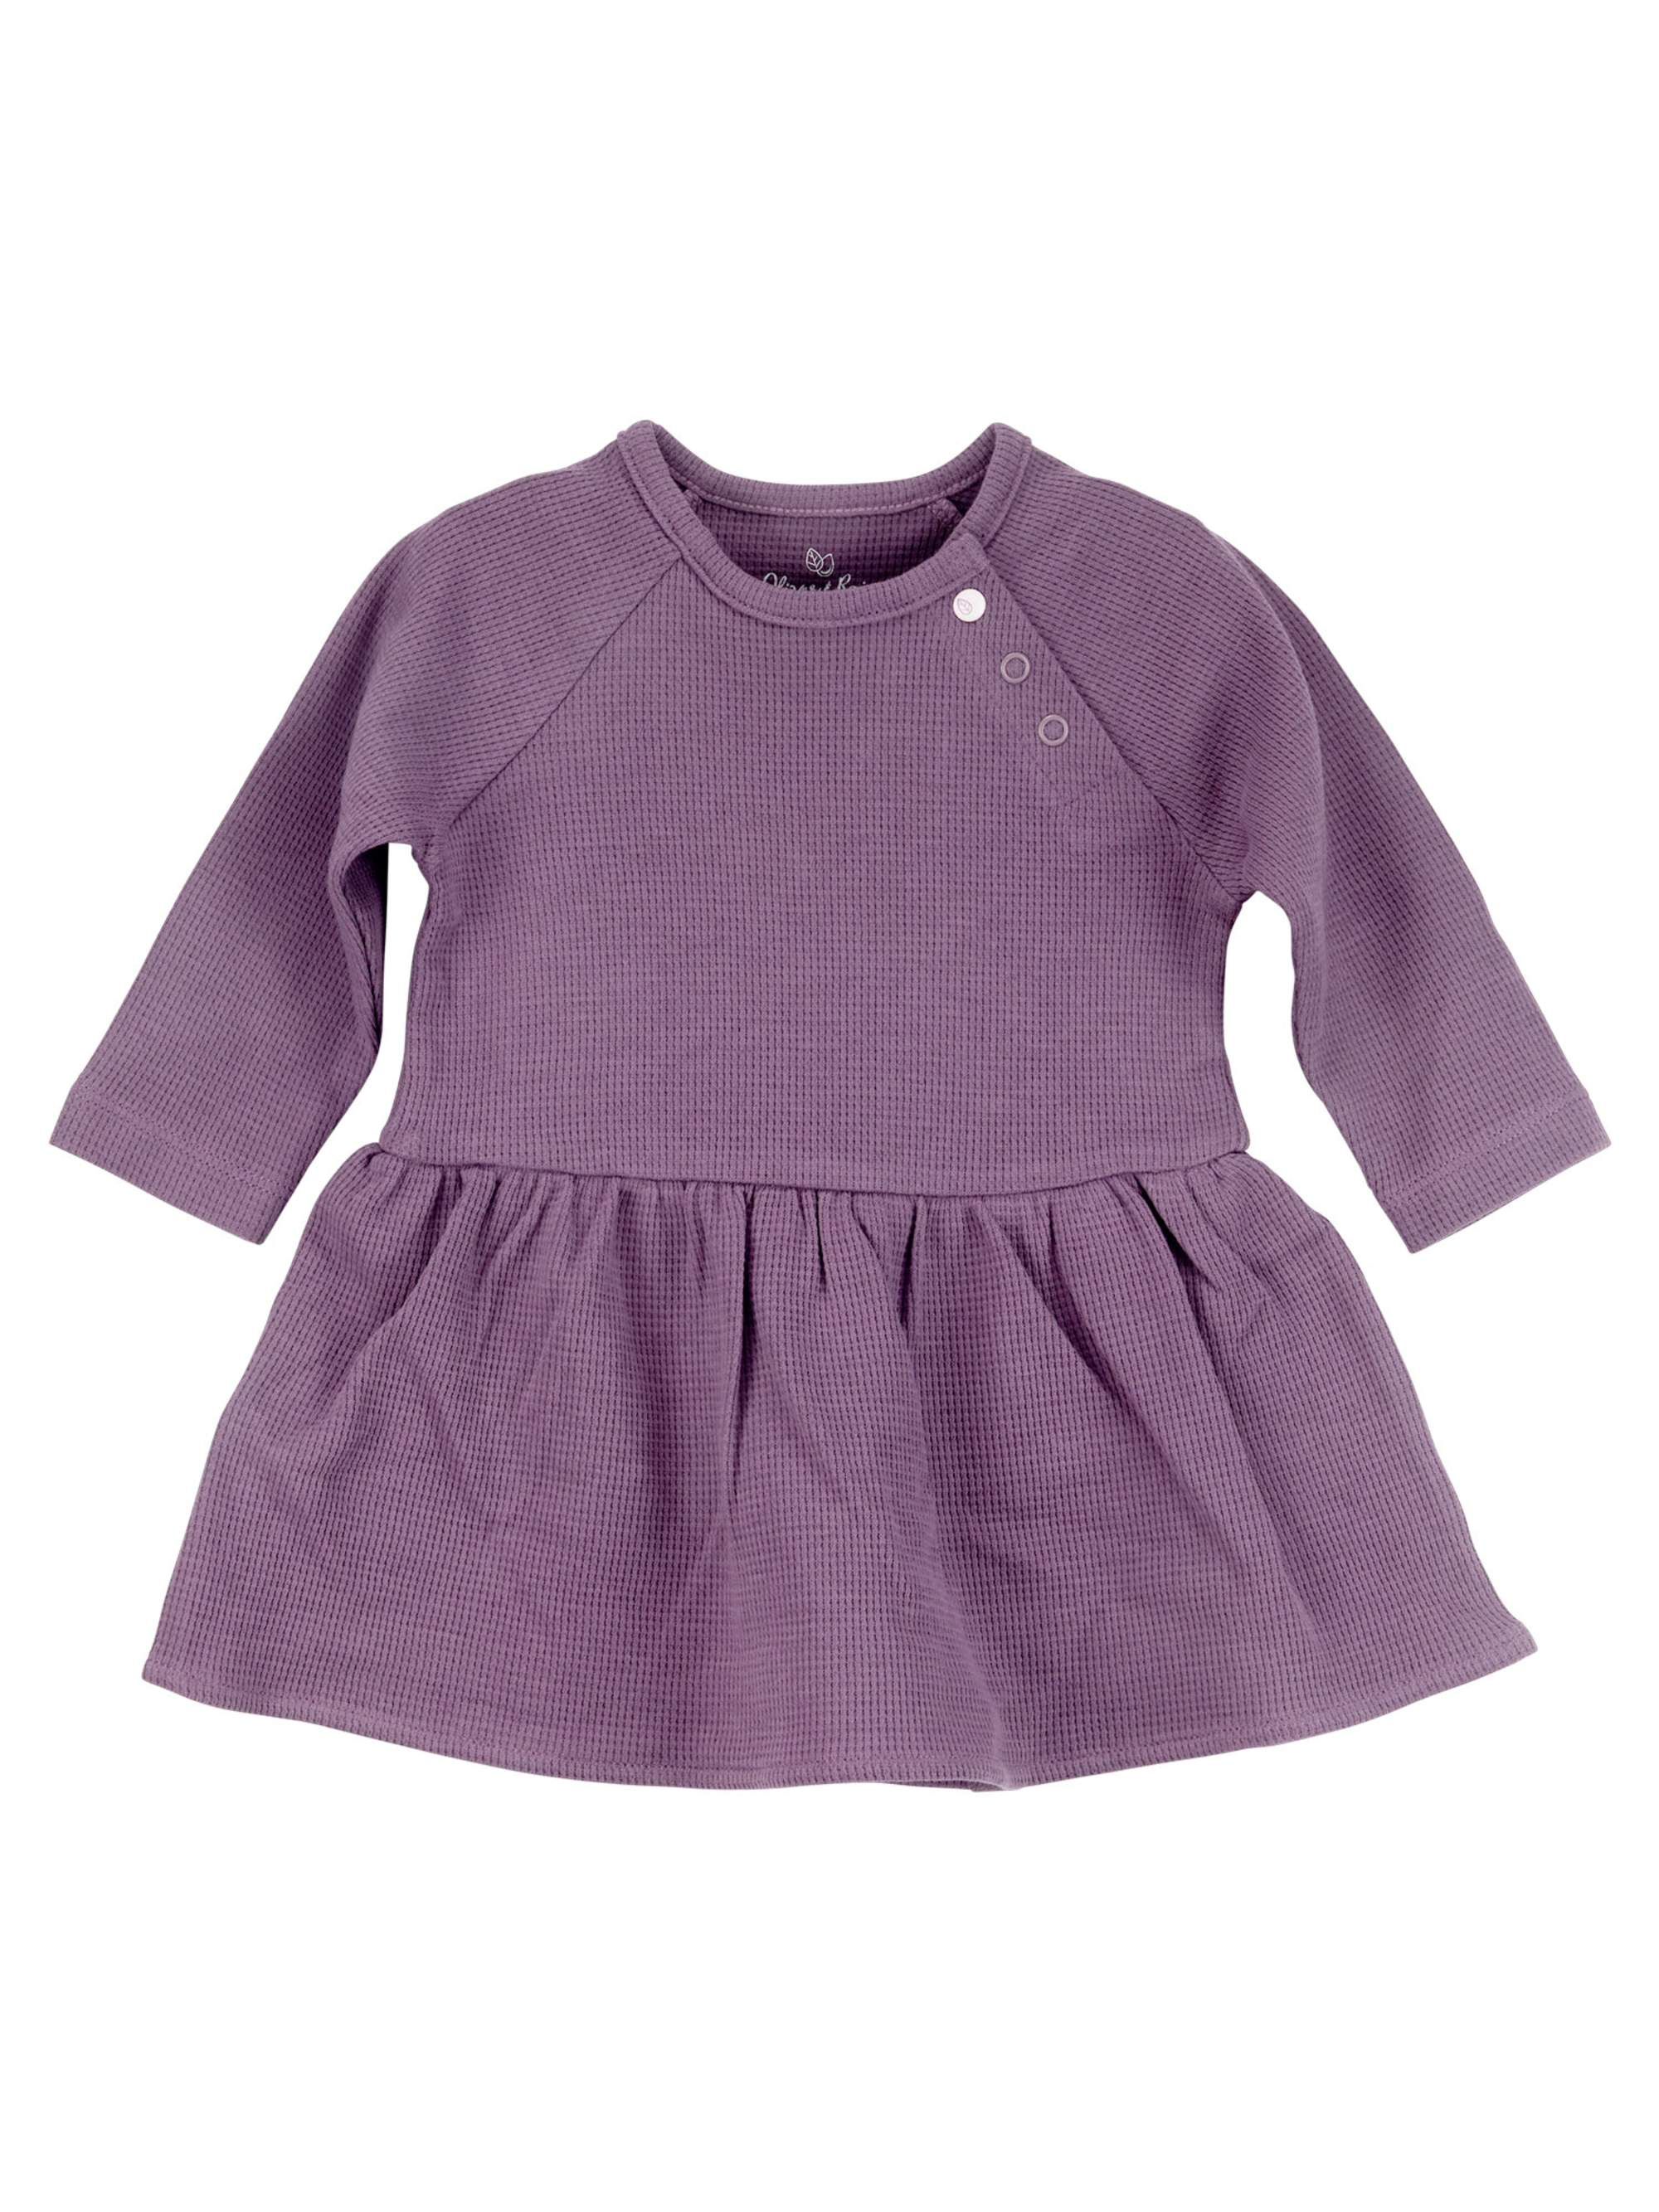 Plum Long Sleeve Bodysuit Dress (Baby Girls)